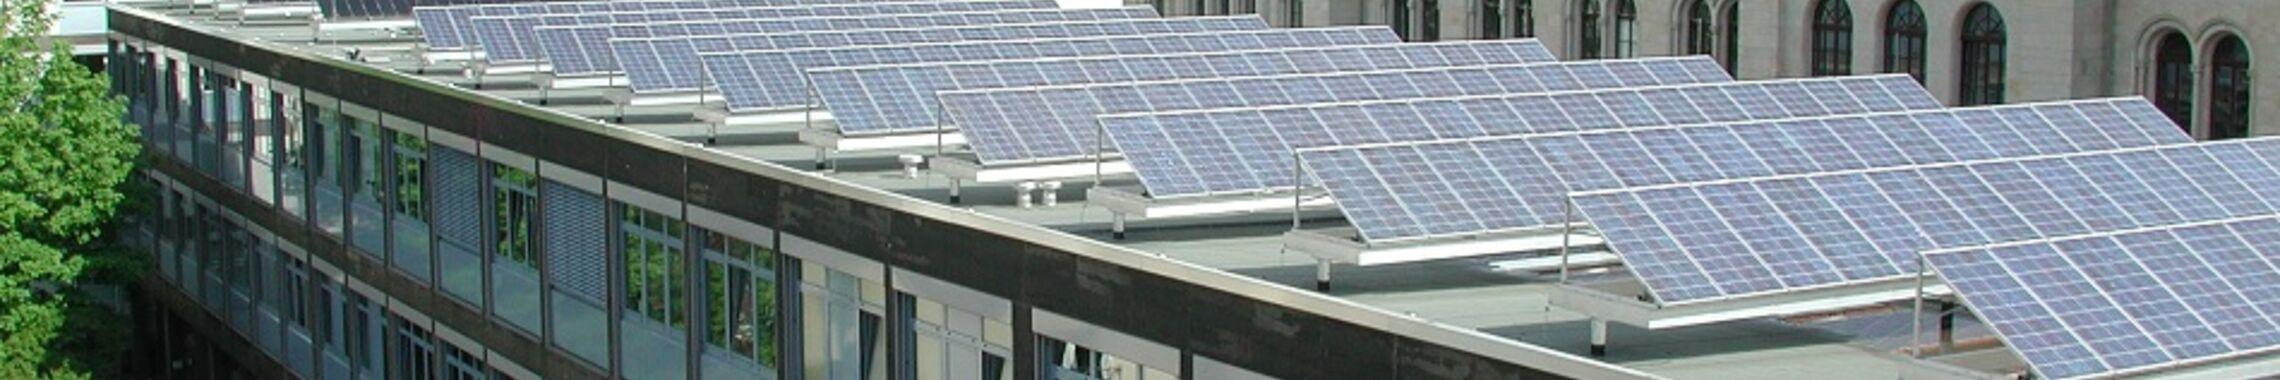 photovoltaikanlage_hkd_header_3